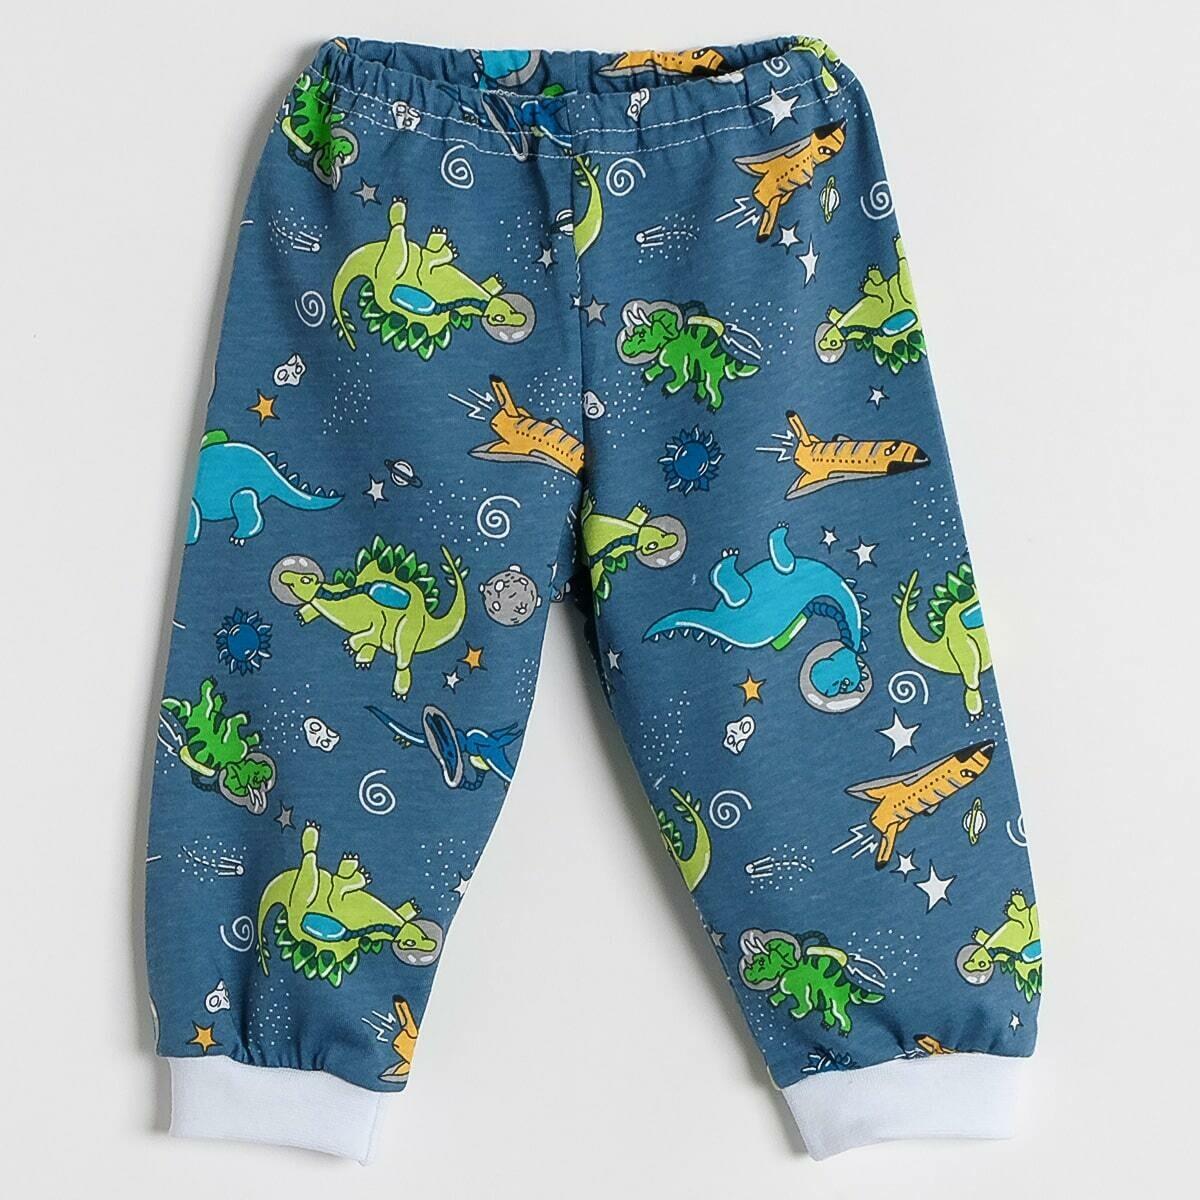 Штанишки на манжетах, тонкий трикотаж, динозавры, синий